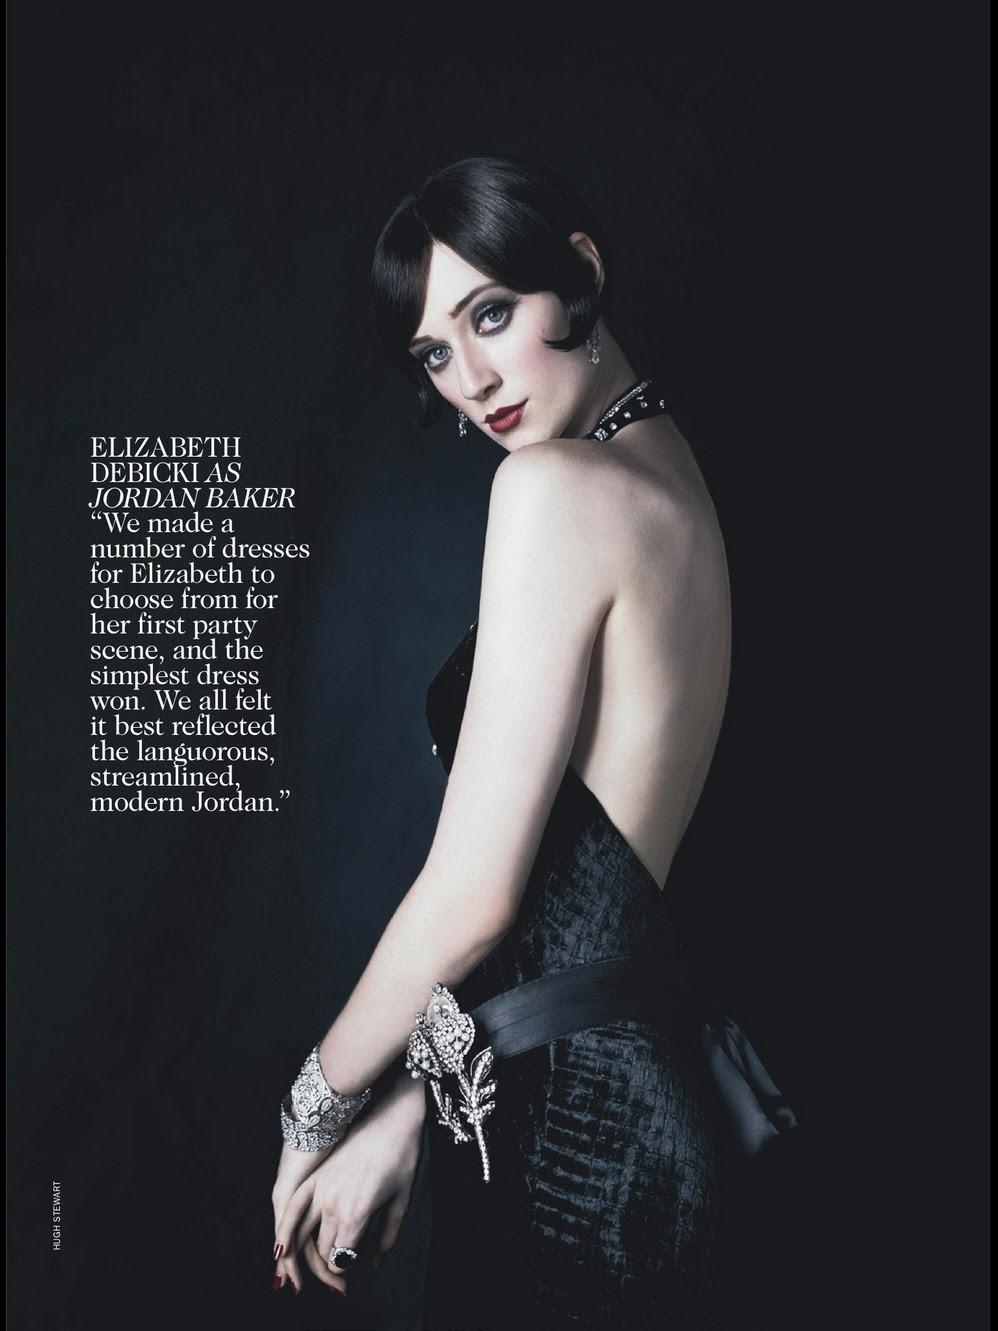 Elizabeth Debicki as Jordan Baker photographed by Hugh Stewart